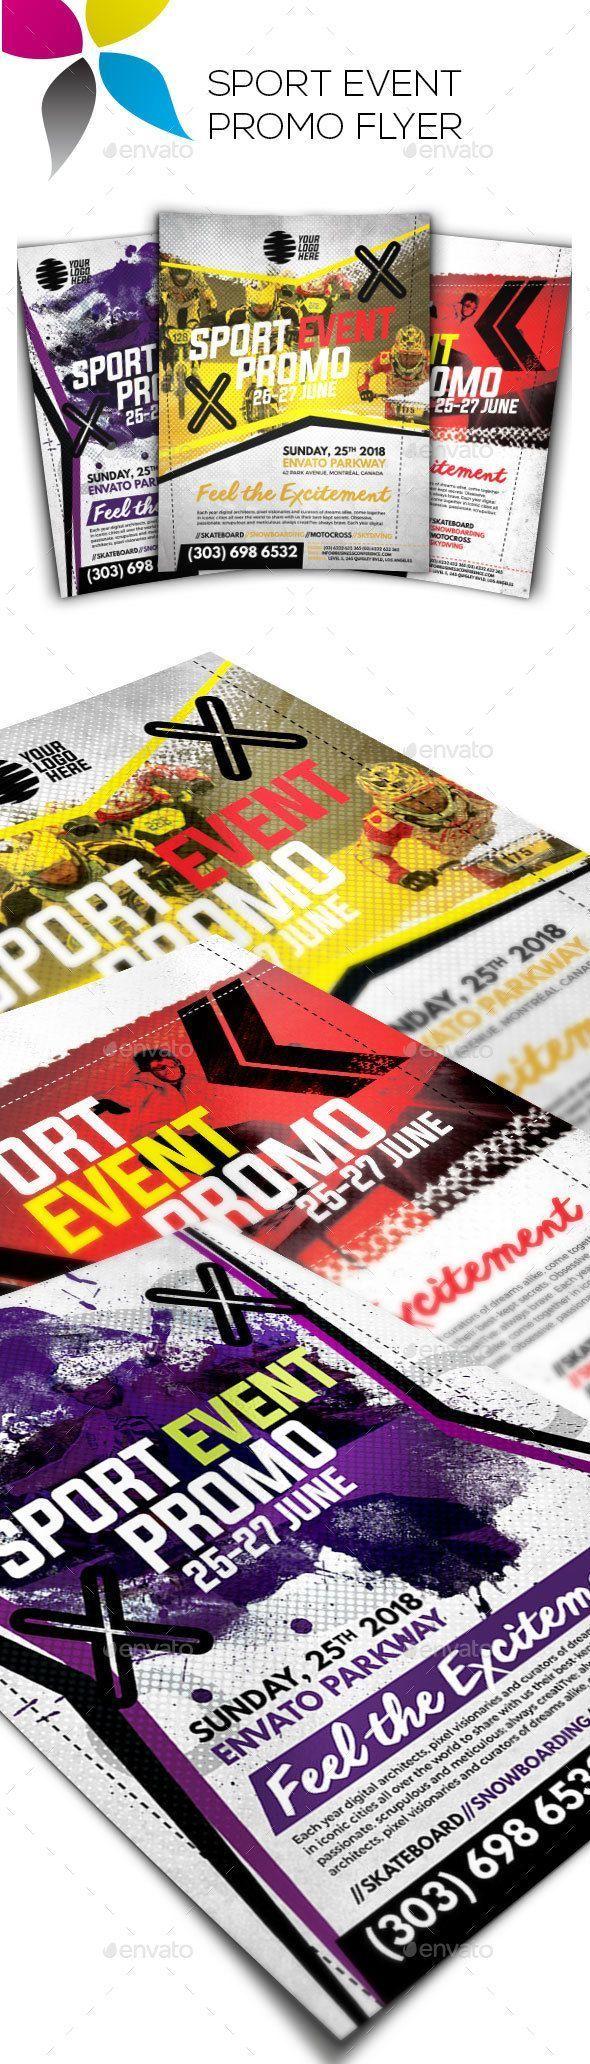 Sport Event Promo Flyer